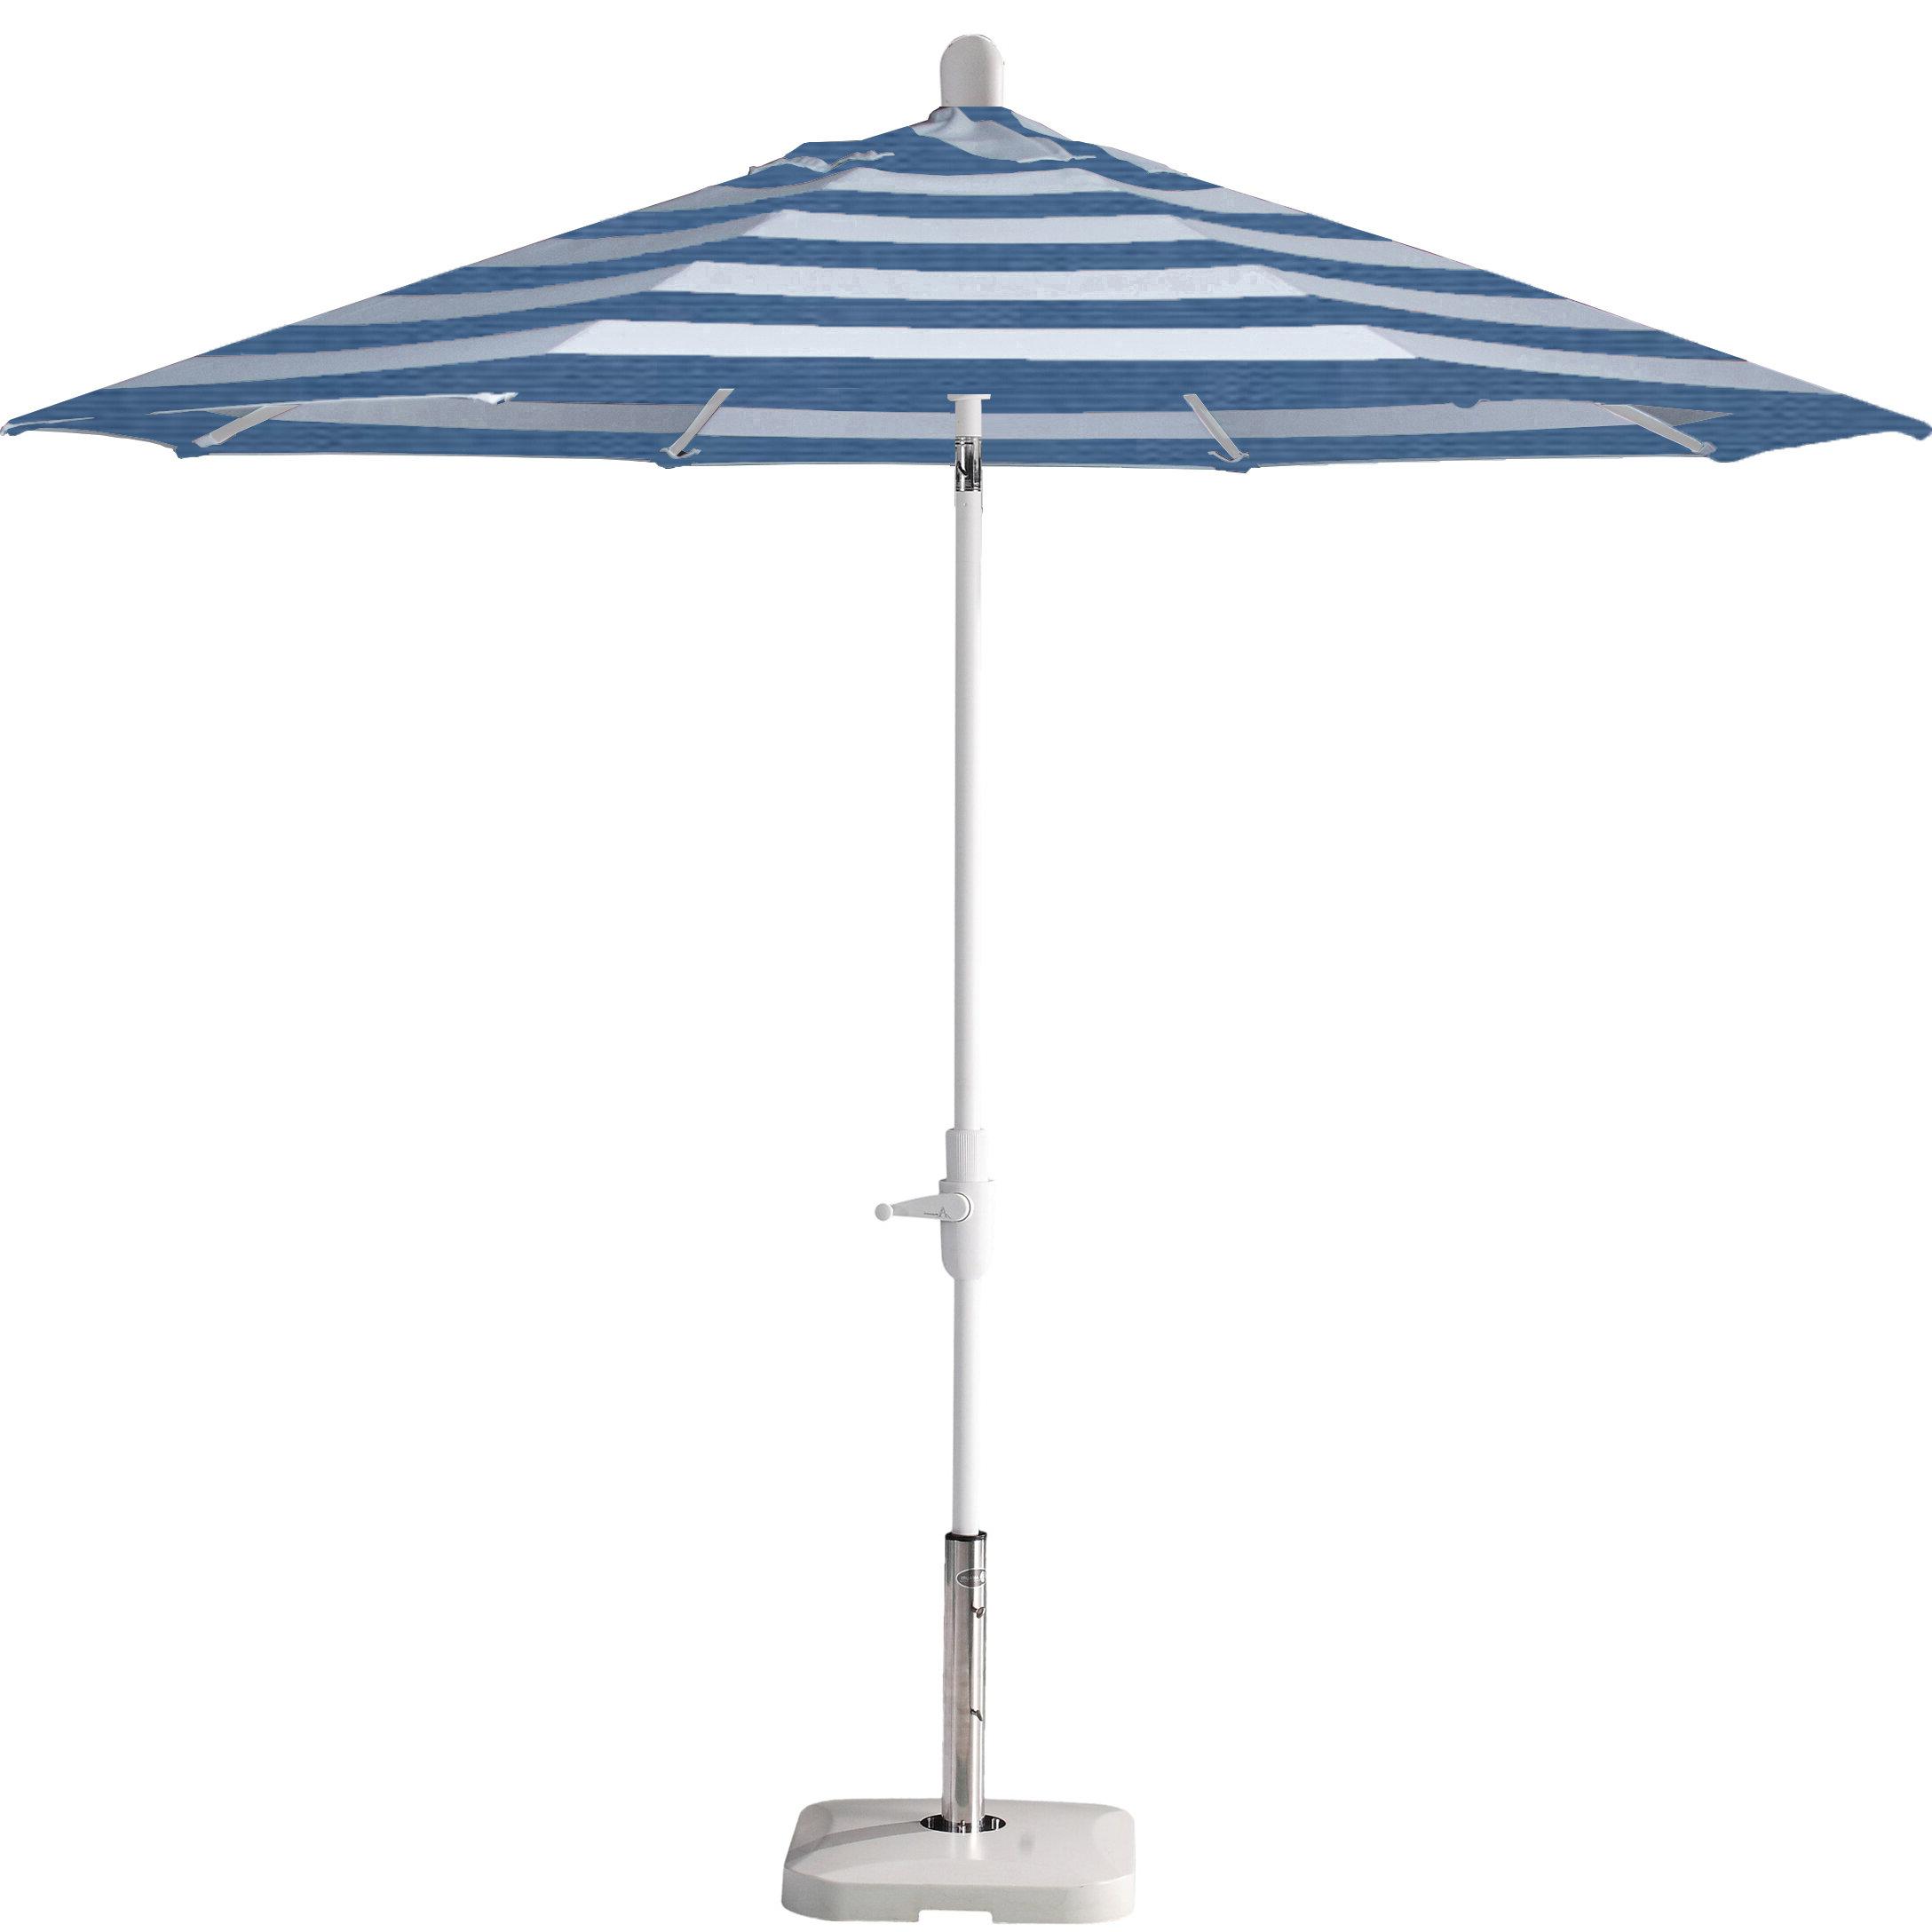 Latest Wiebe Auto Tilt 9' Market Sunbrella Umbrella Inside Wiebe Market Sunbrella Umbrellas (View 5 of 20)